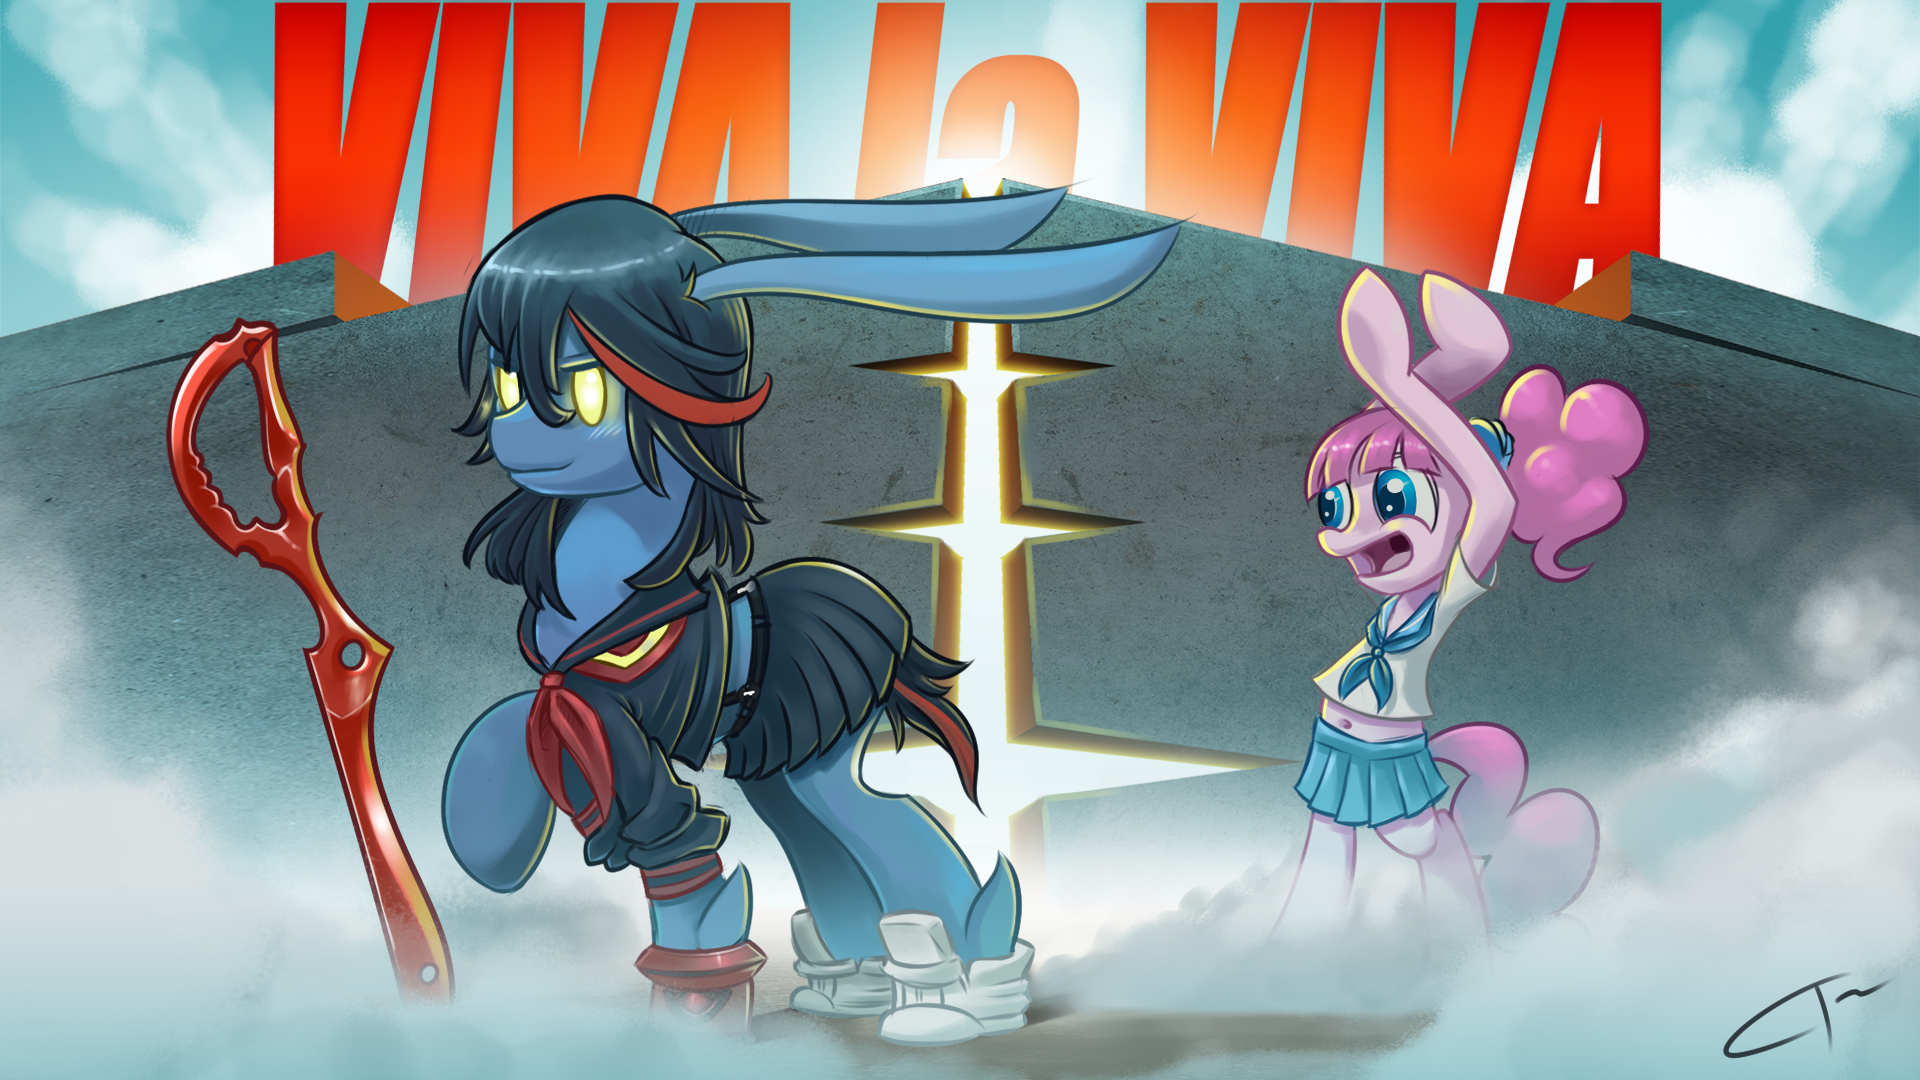 VIVA la VIVA by CyberToaster